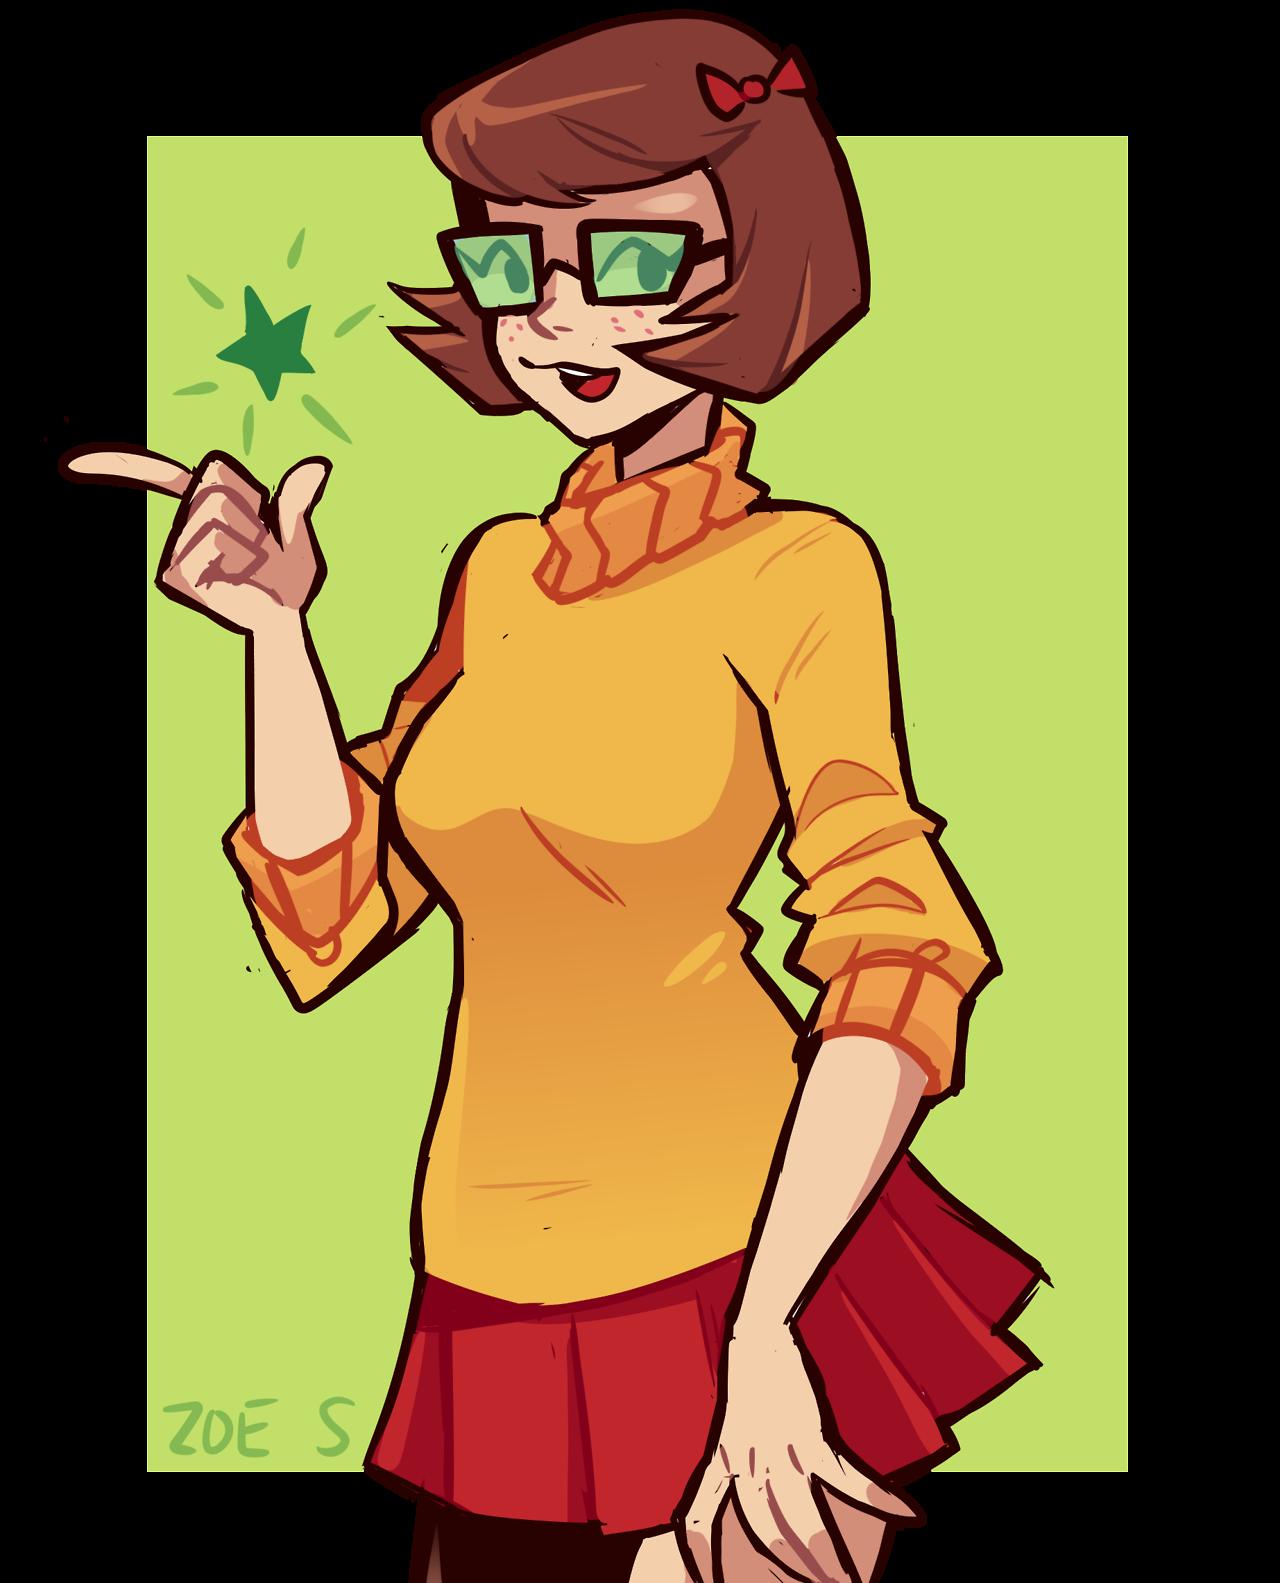 Jinkies Scooby Doo Velma Scooby Doo Art